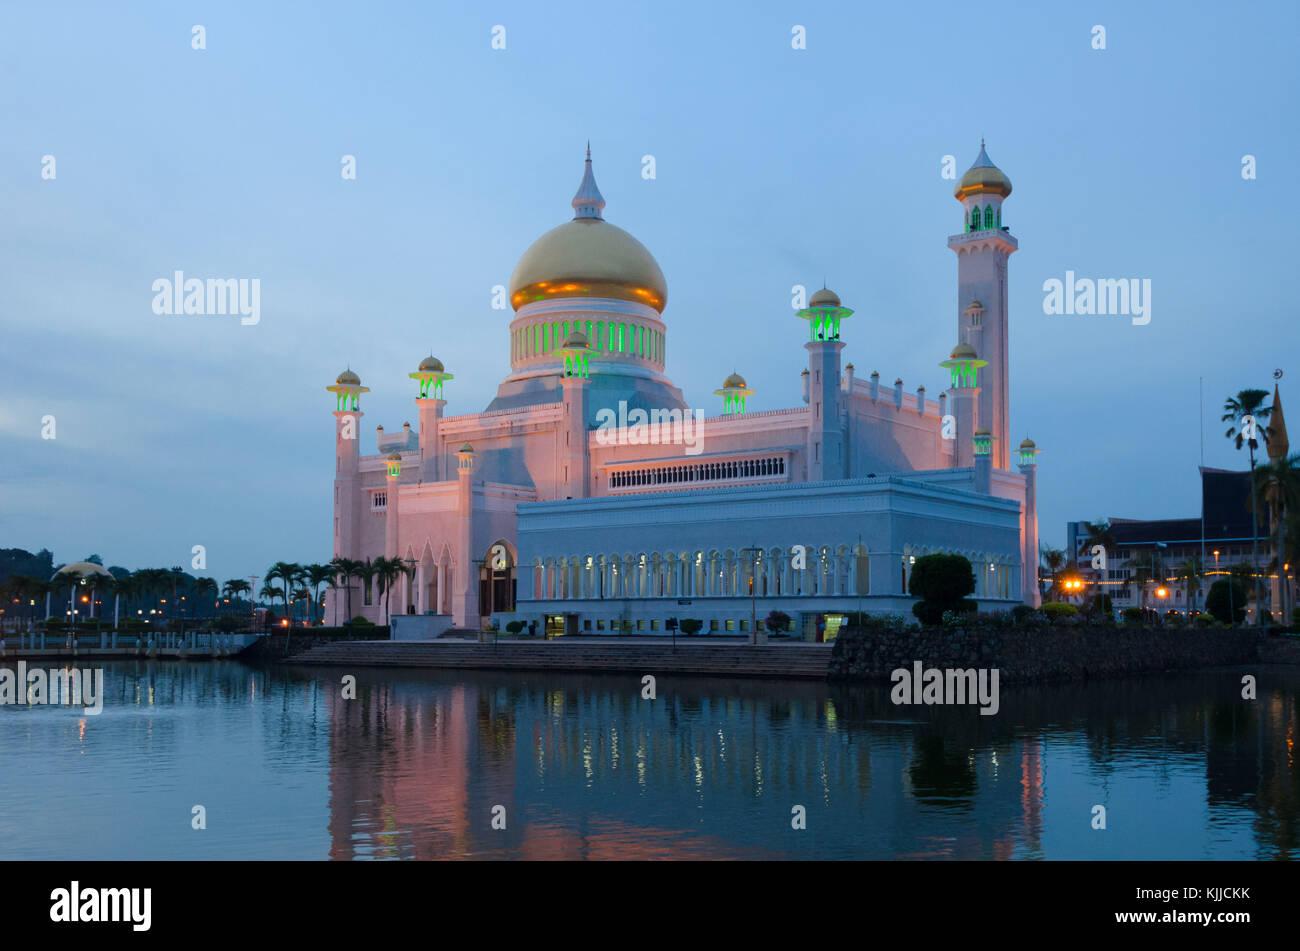 Omar Ali Saifuddien Mosque dominates the small city centre of Brunei's capital, Bandar Sri Begawan, on Borneo - Stock Image